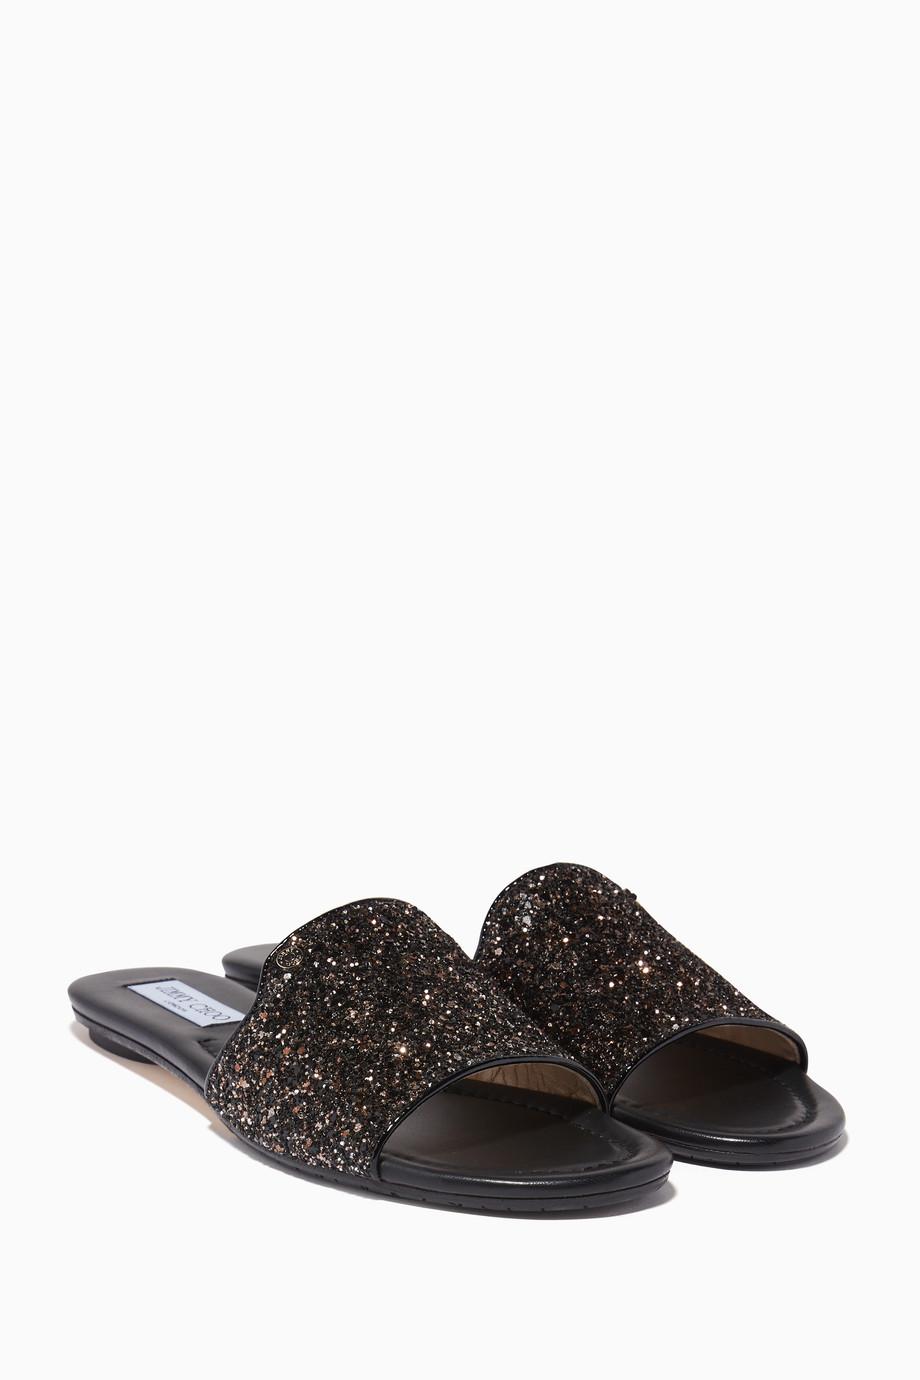 8650f059d2c Shop Jimmy Choo Black Bronze Glitter Nanda Slides for Women